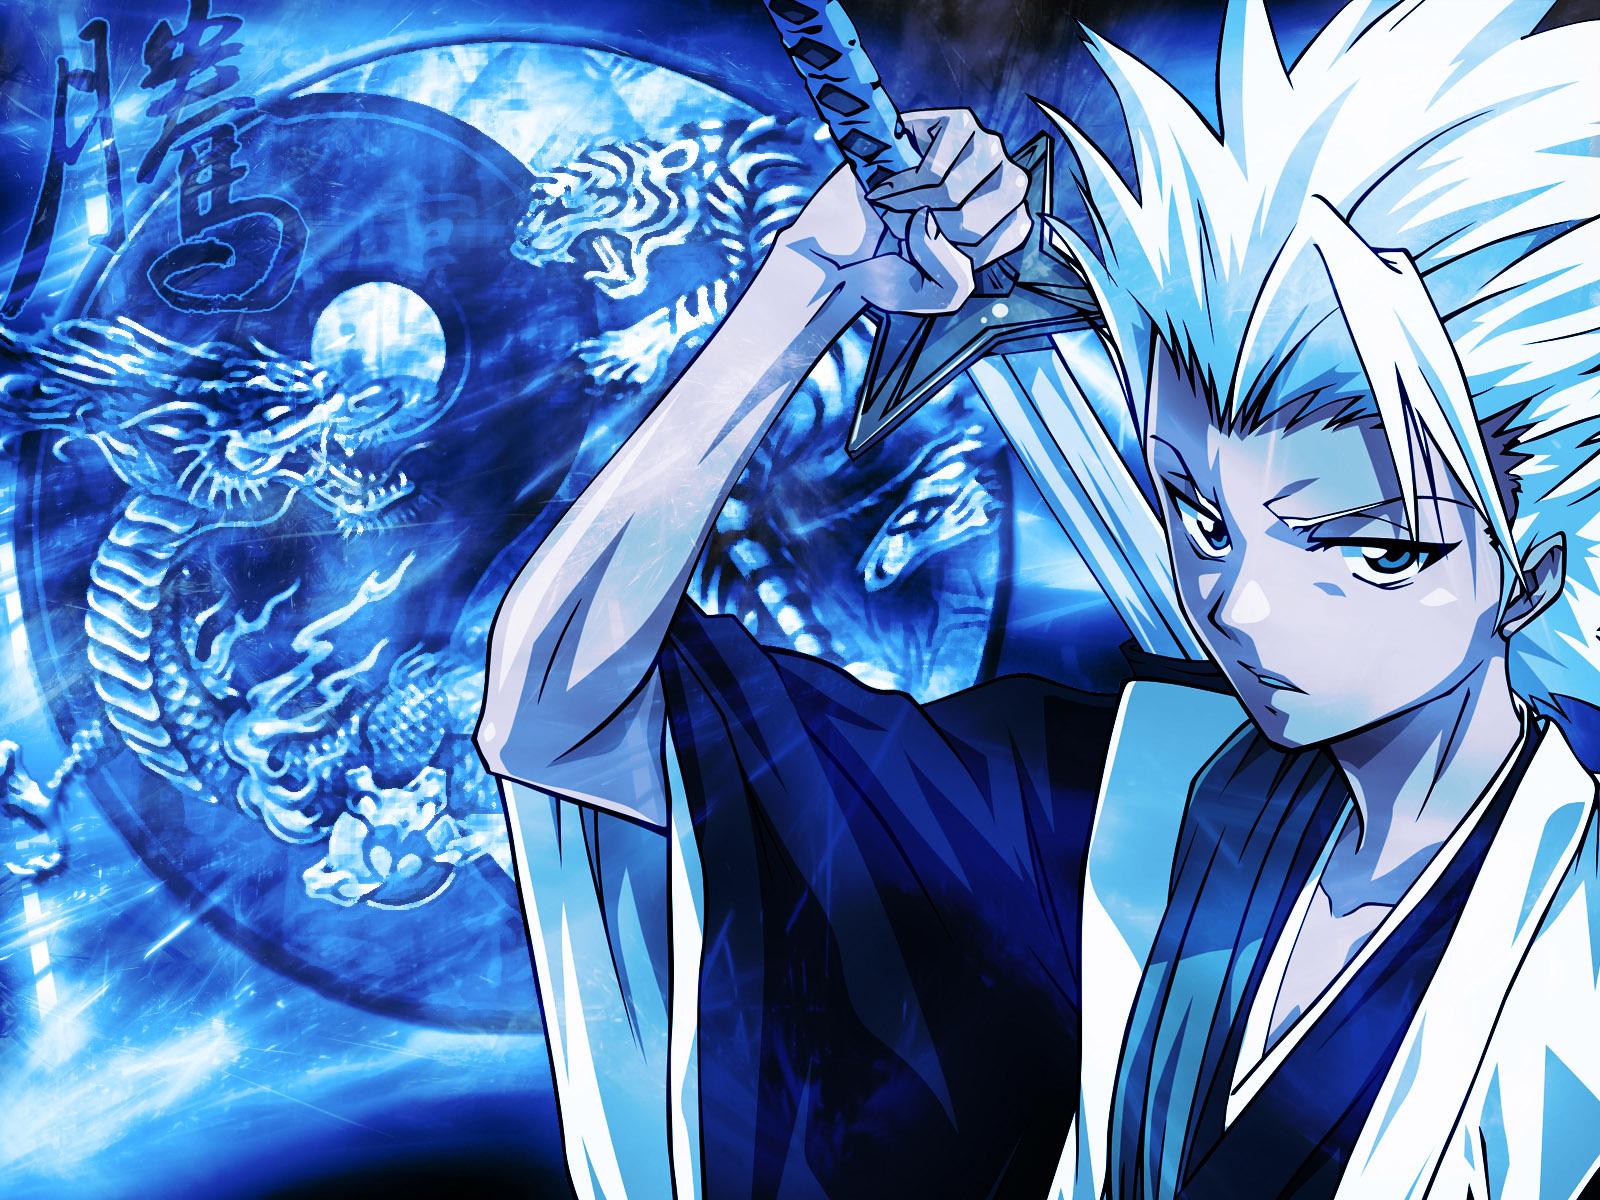 Best desktop hd wallpaper bleach wallpapers - Best anime desktop backgrounds ...